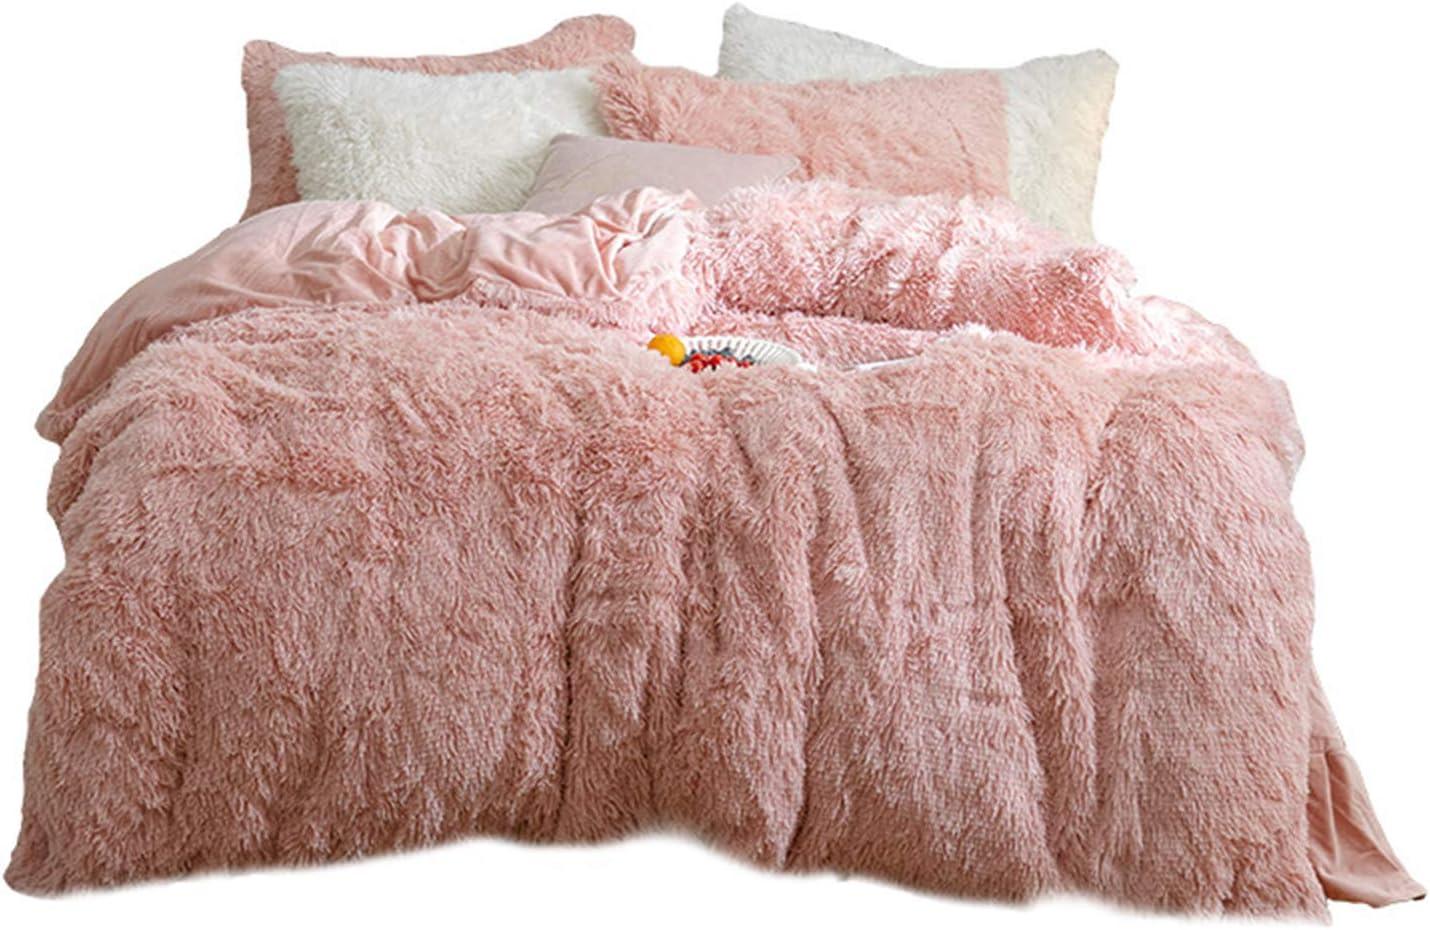 Lishiny Fluffy Blanket with Pillow Cover 3 Pcs Set, Faux Fur Velvet Fluffy Bedding Duvet Cover Set Warm and Durable for Bedroom